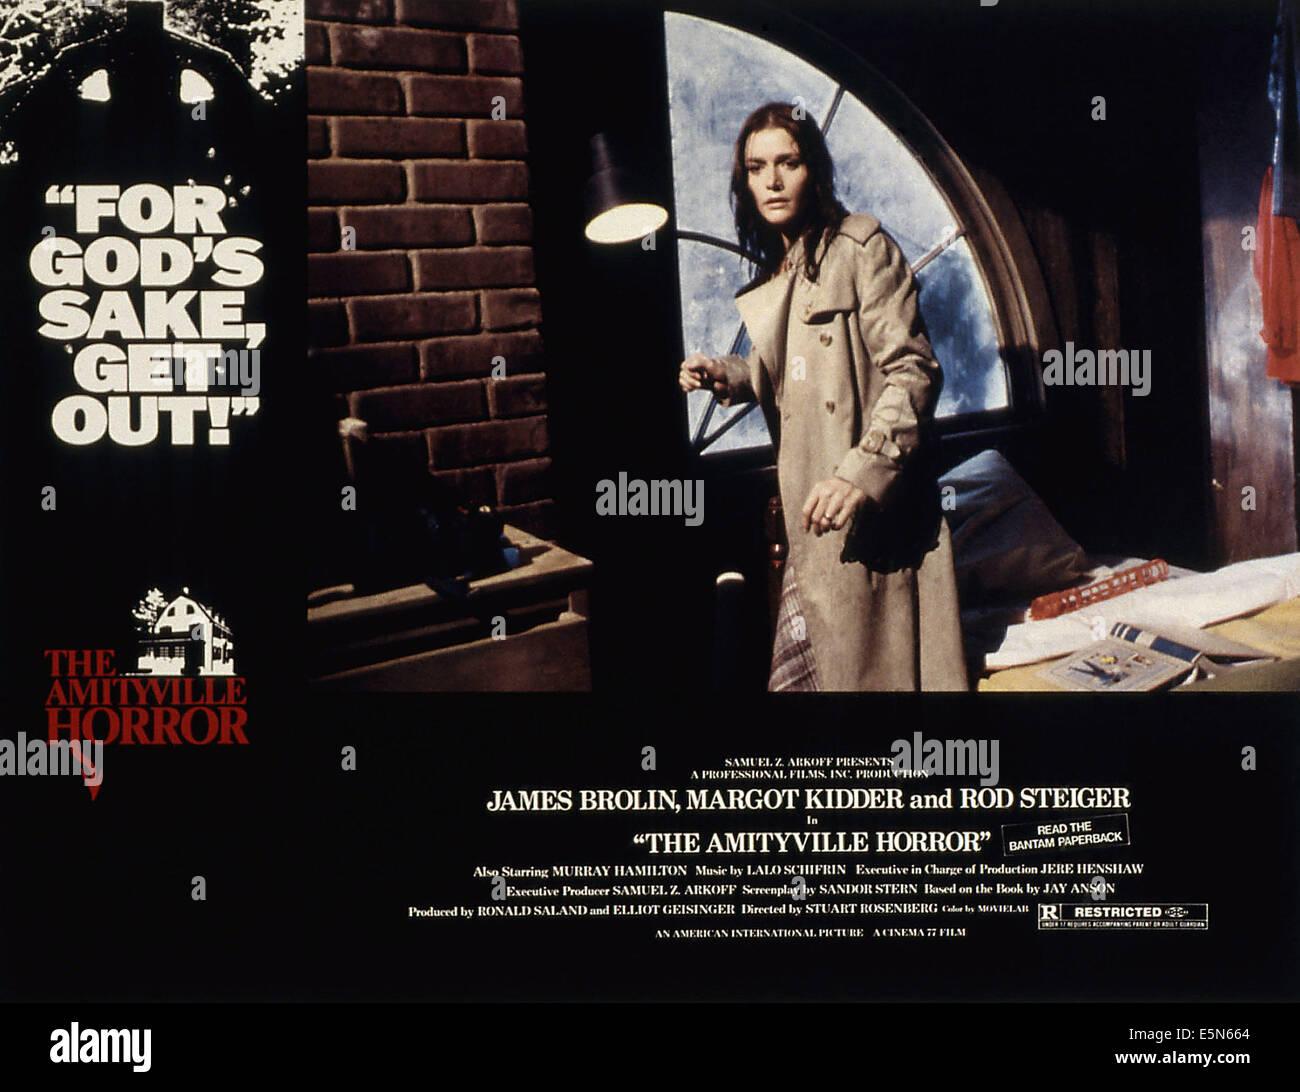 THE AMITYVILLE HORROR, Margot Kidder, 1979, (c) MGM/UA/courtesy Everett Collection - Stock Image